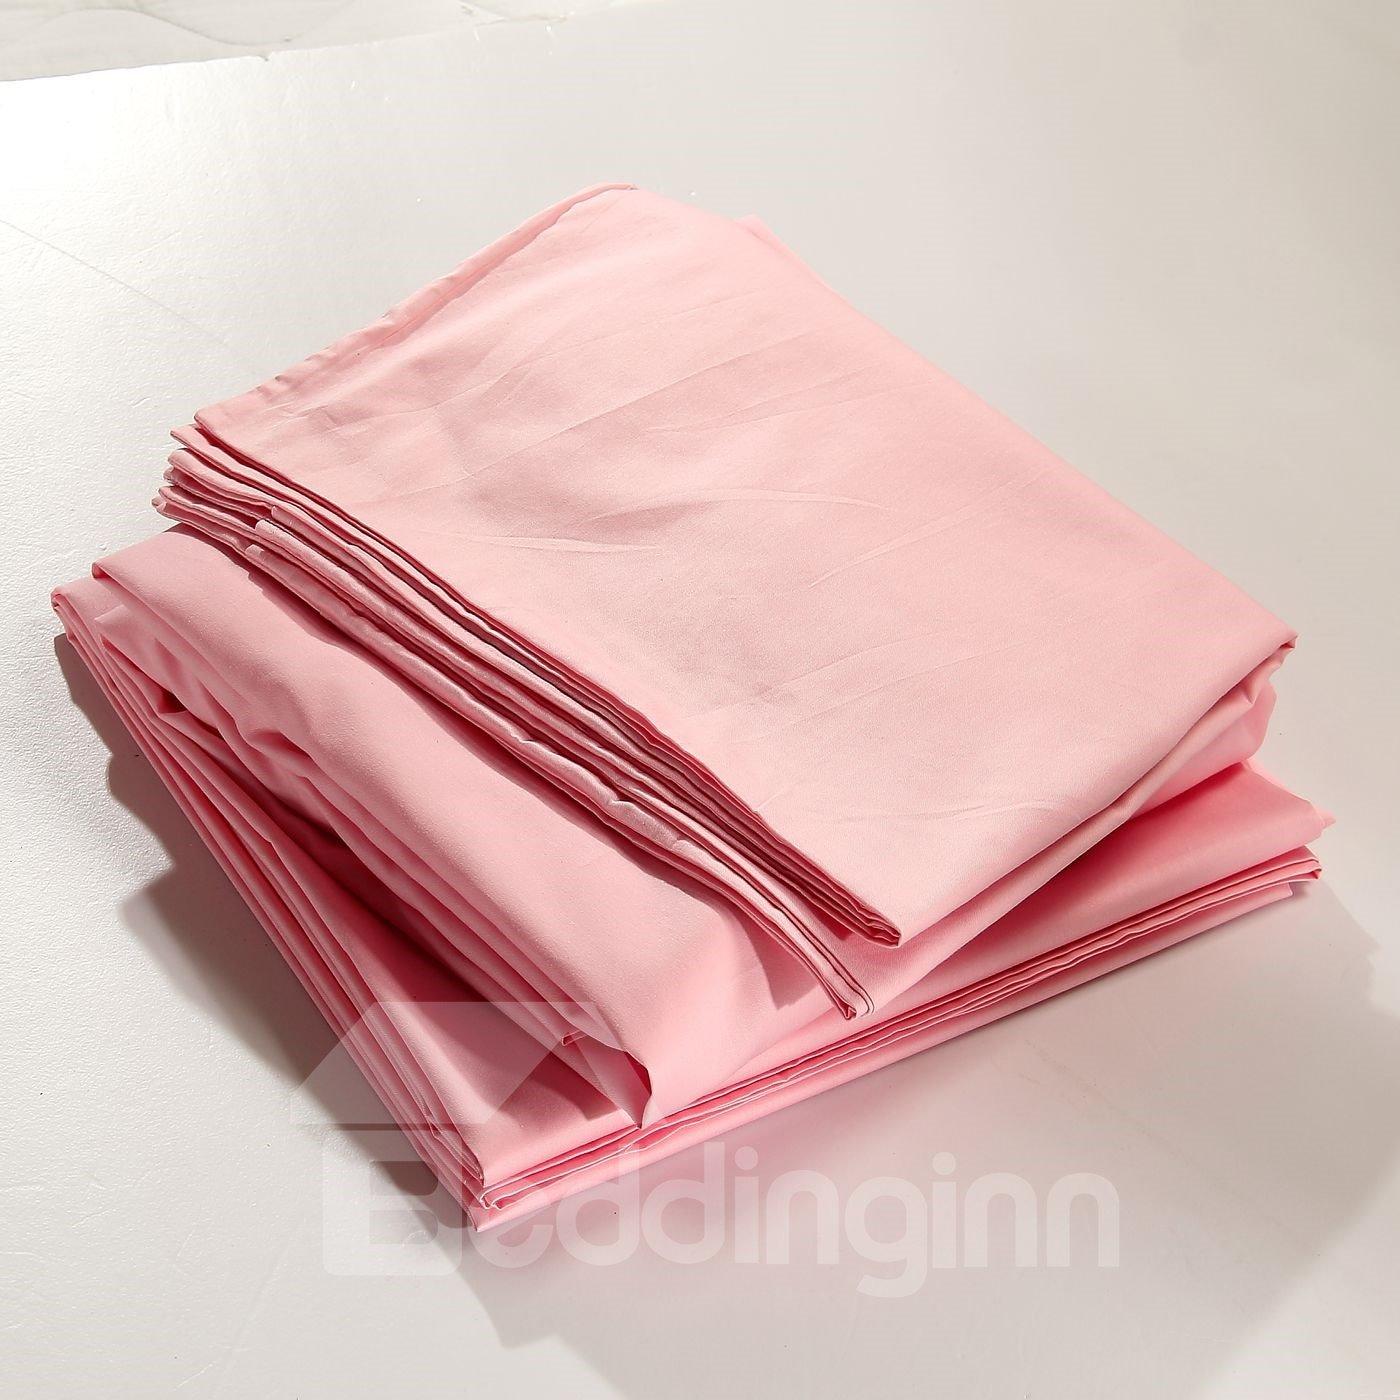 Exquisite Workmanship Bright Pink 4-Piece Cotton Sheet Set